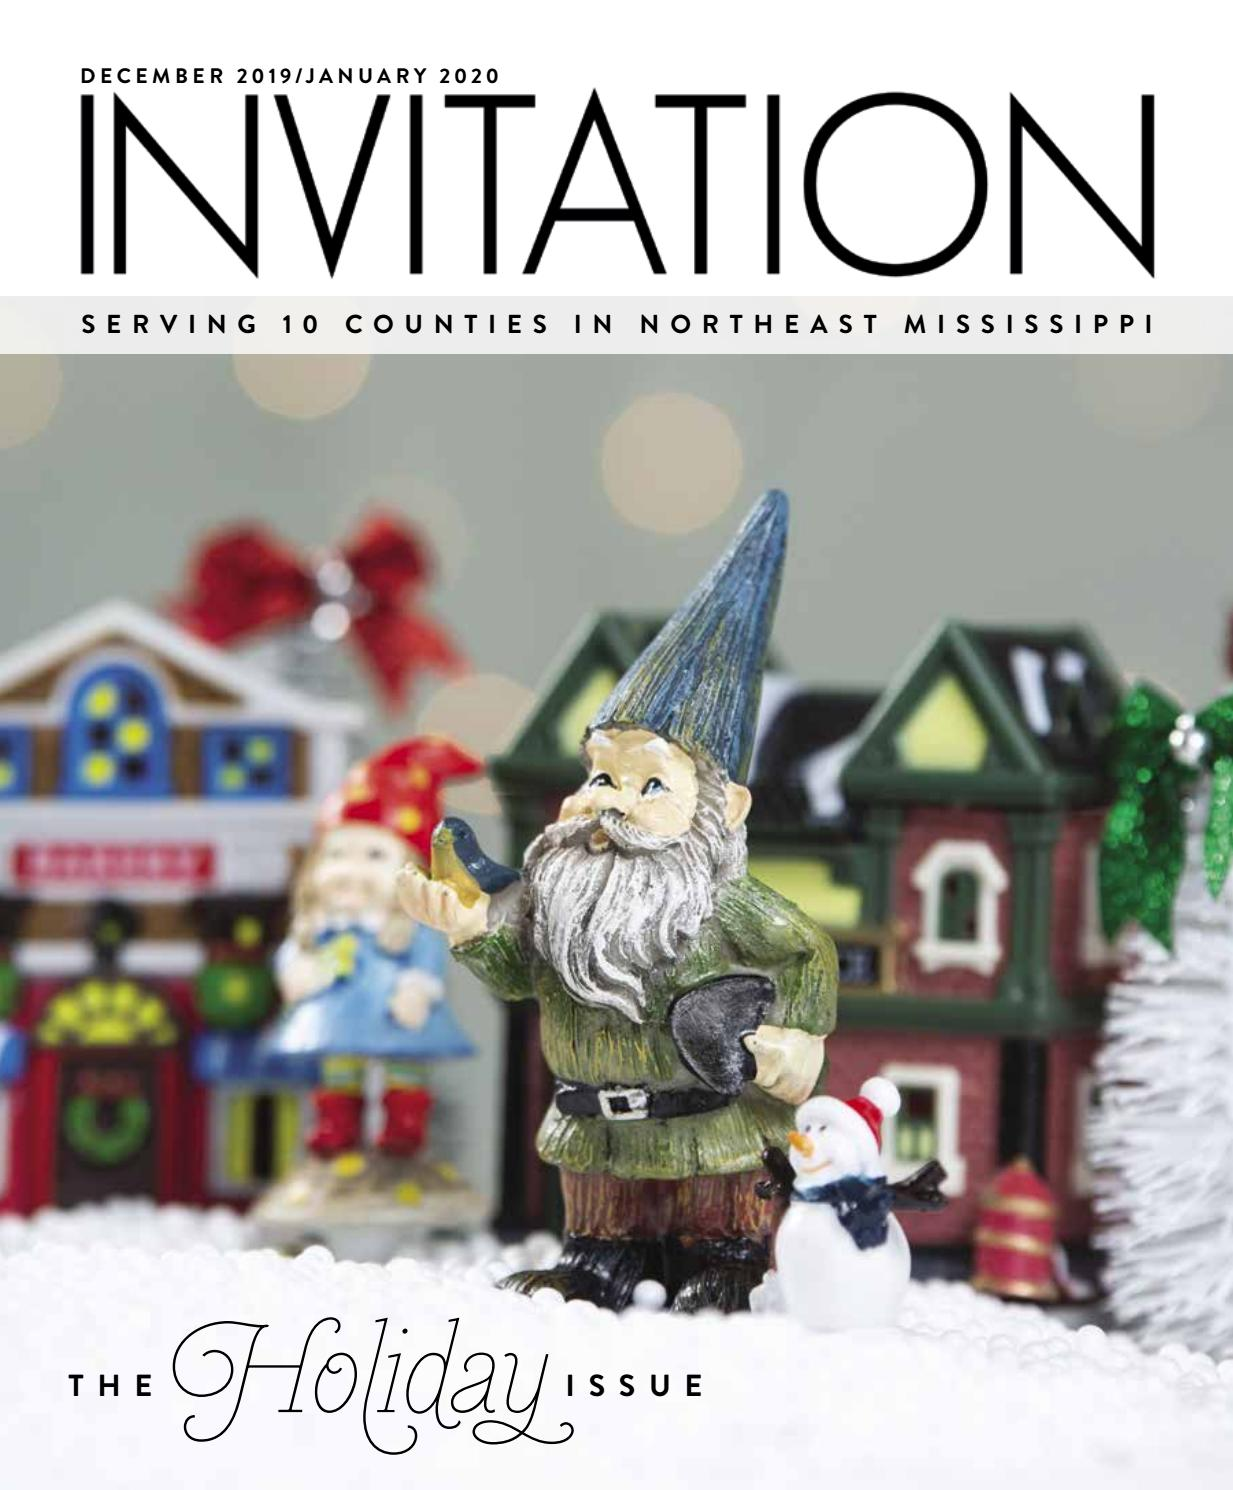 Nmso Christmas Concert 2020 Invitation Magazine   December 2019/January 2020 by Invitation